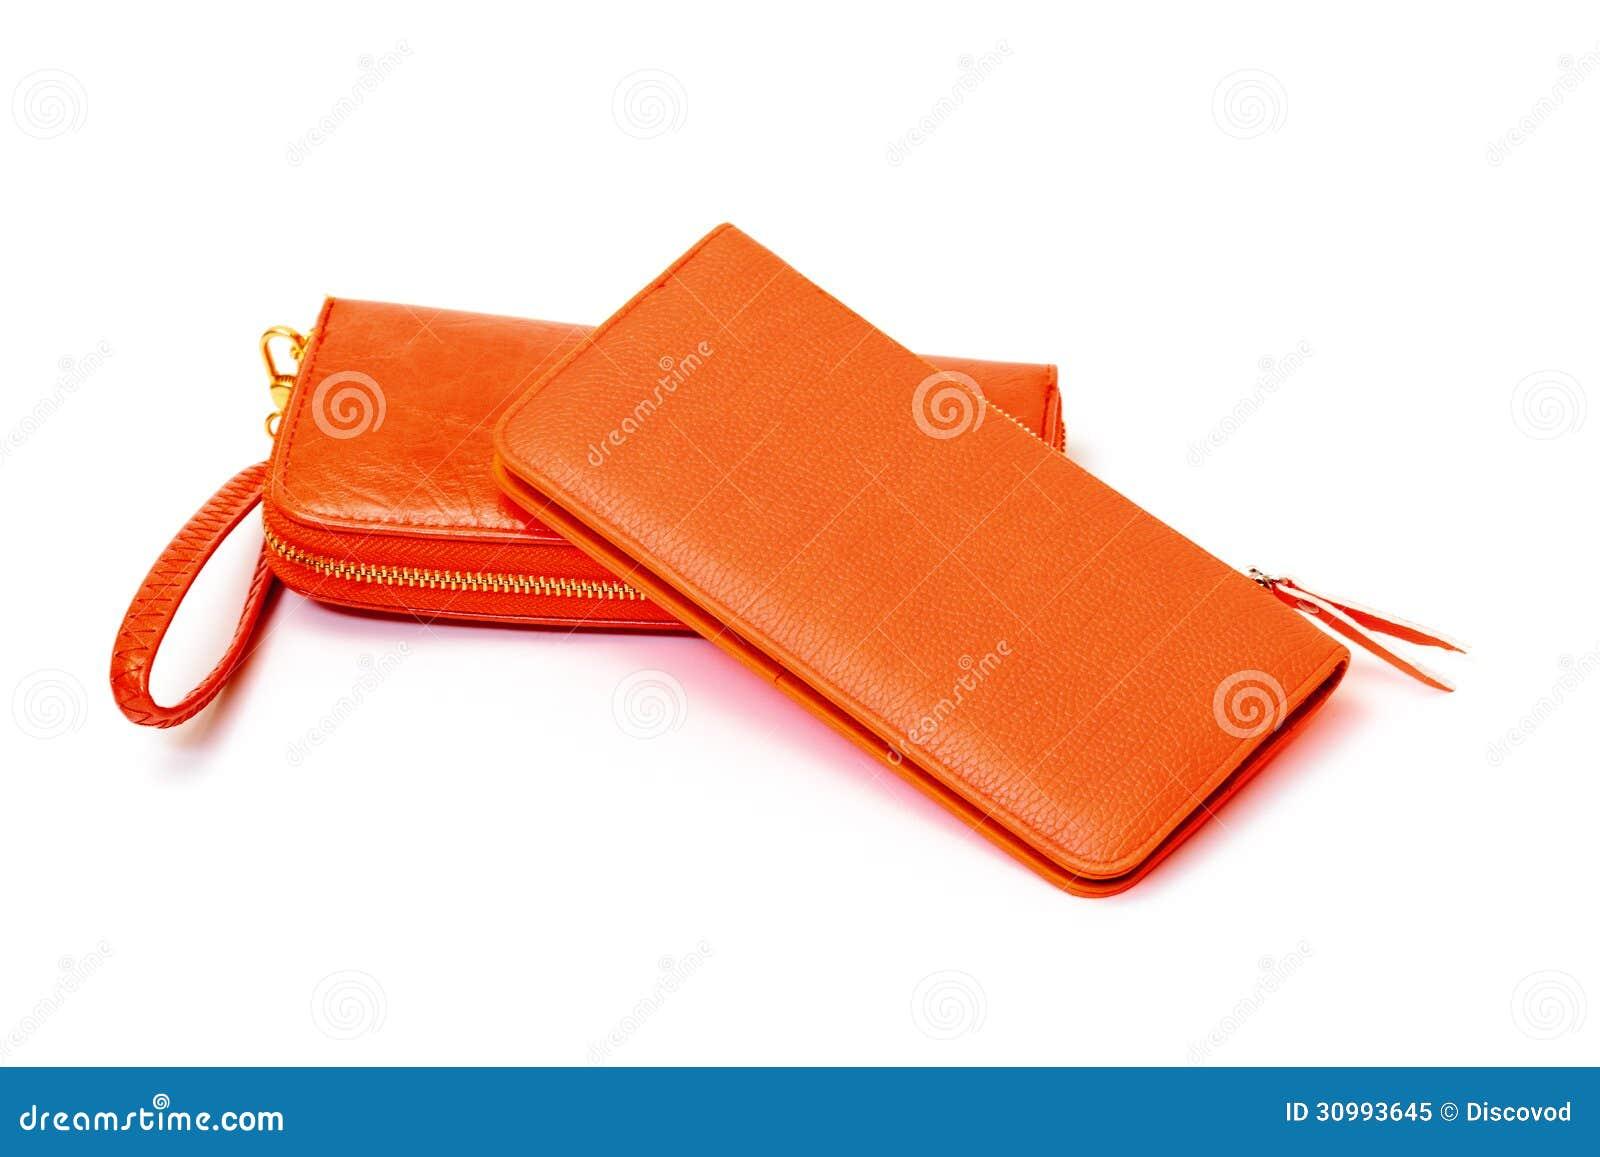 New Orange Leather Wallets Royalty Free Stock Photo